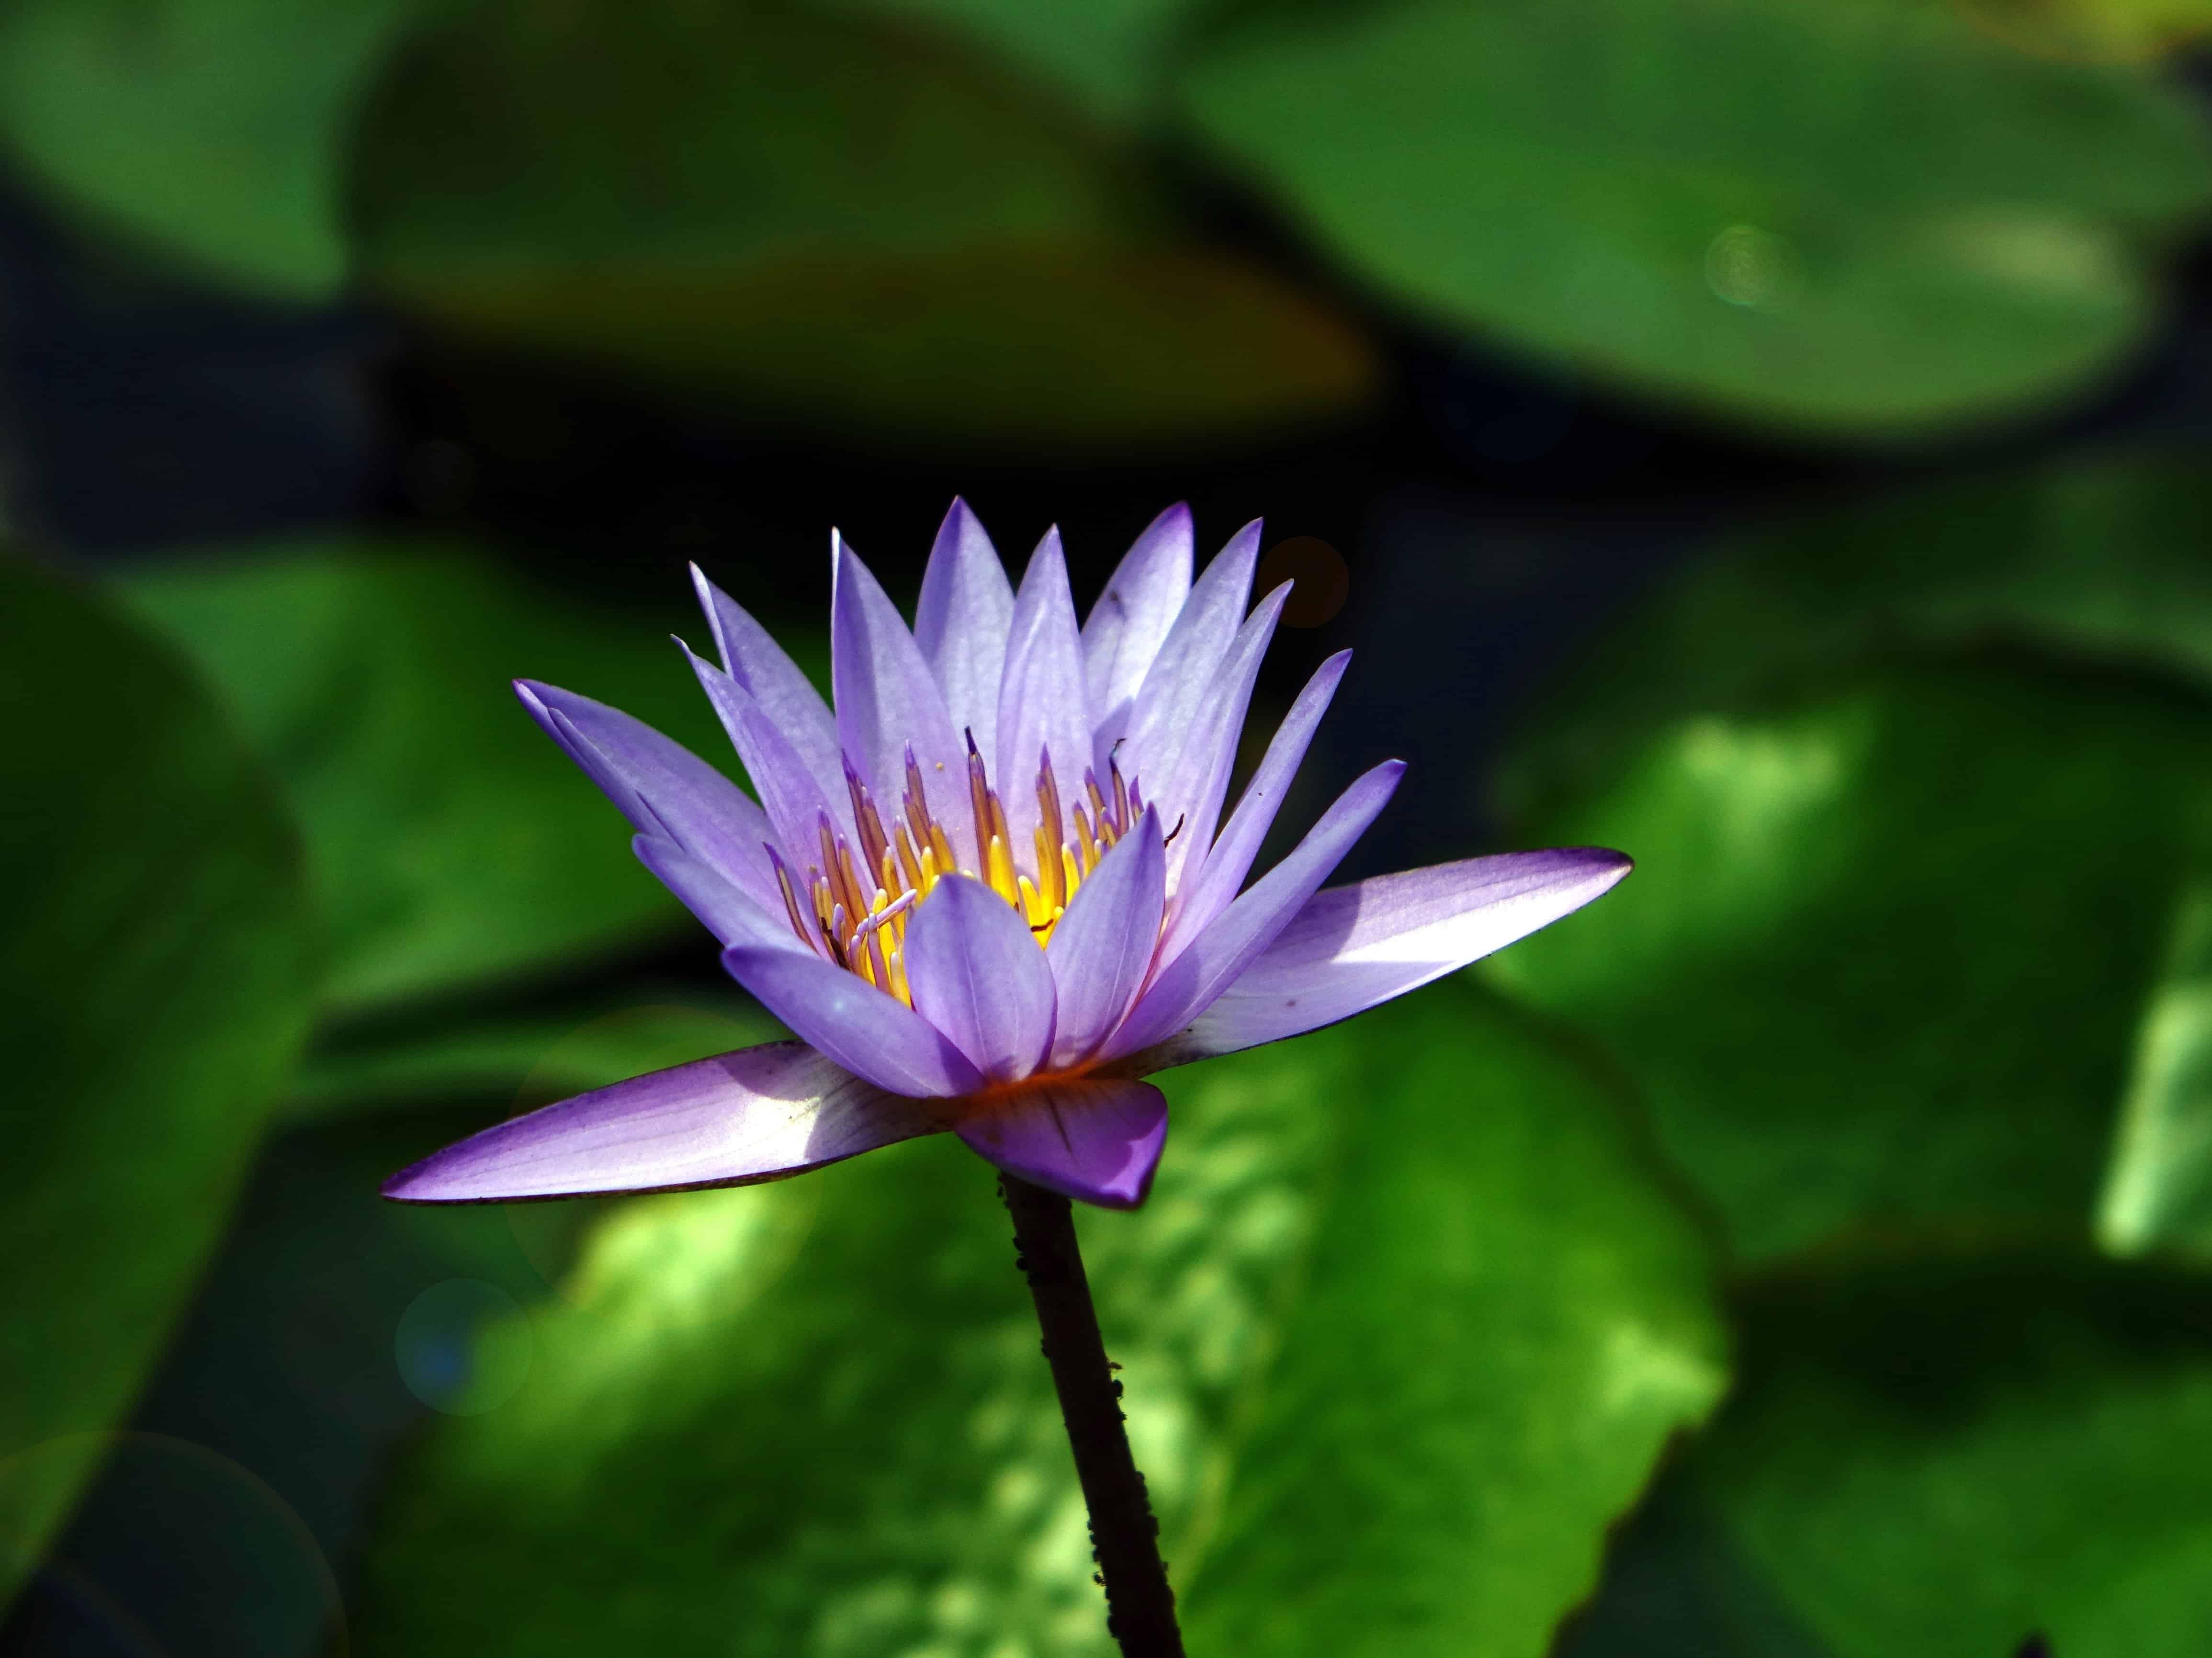 Imagen Gratis Lotus Ecolog A Naturaleza Acu Tico Flora Flor  # Muebles Nenufar